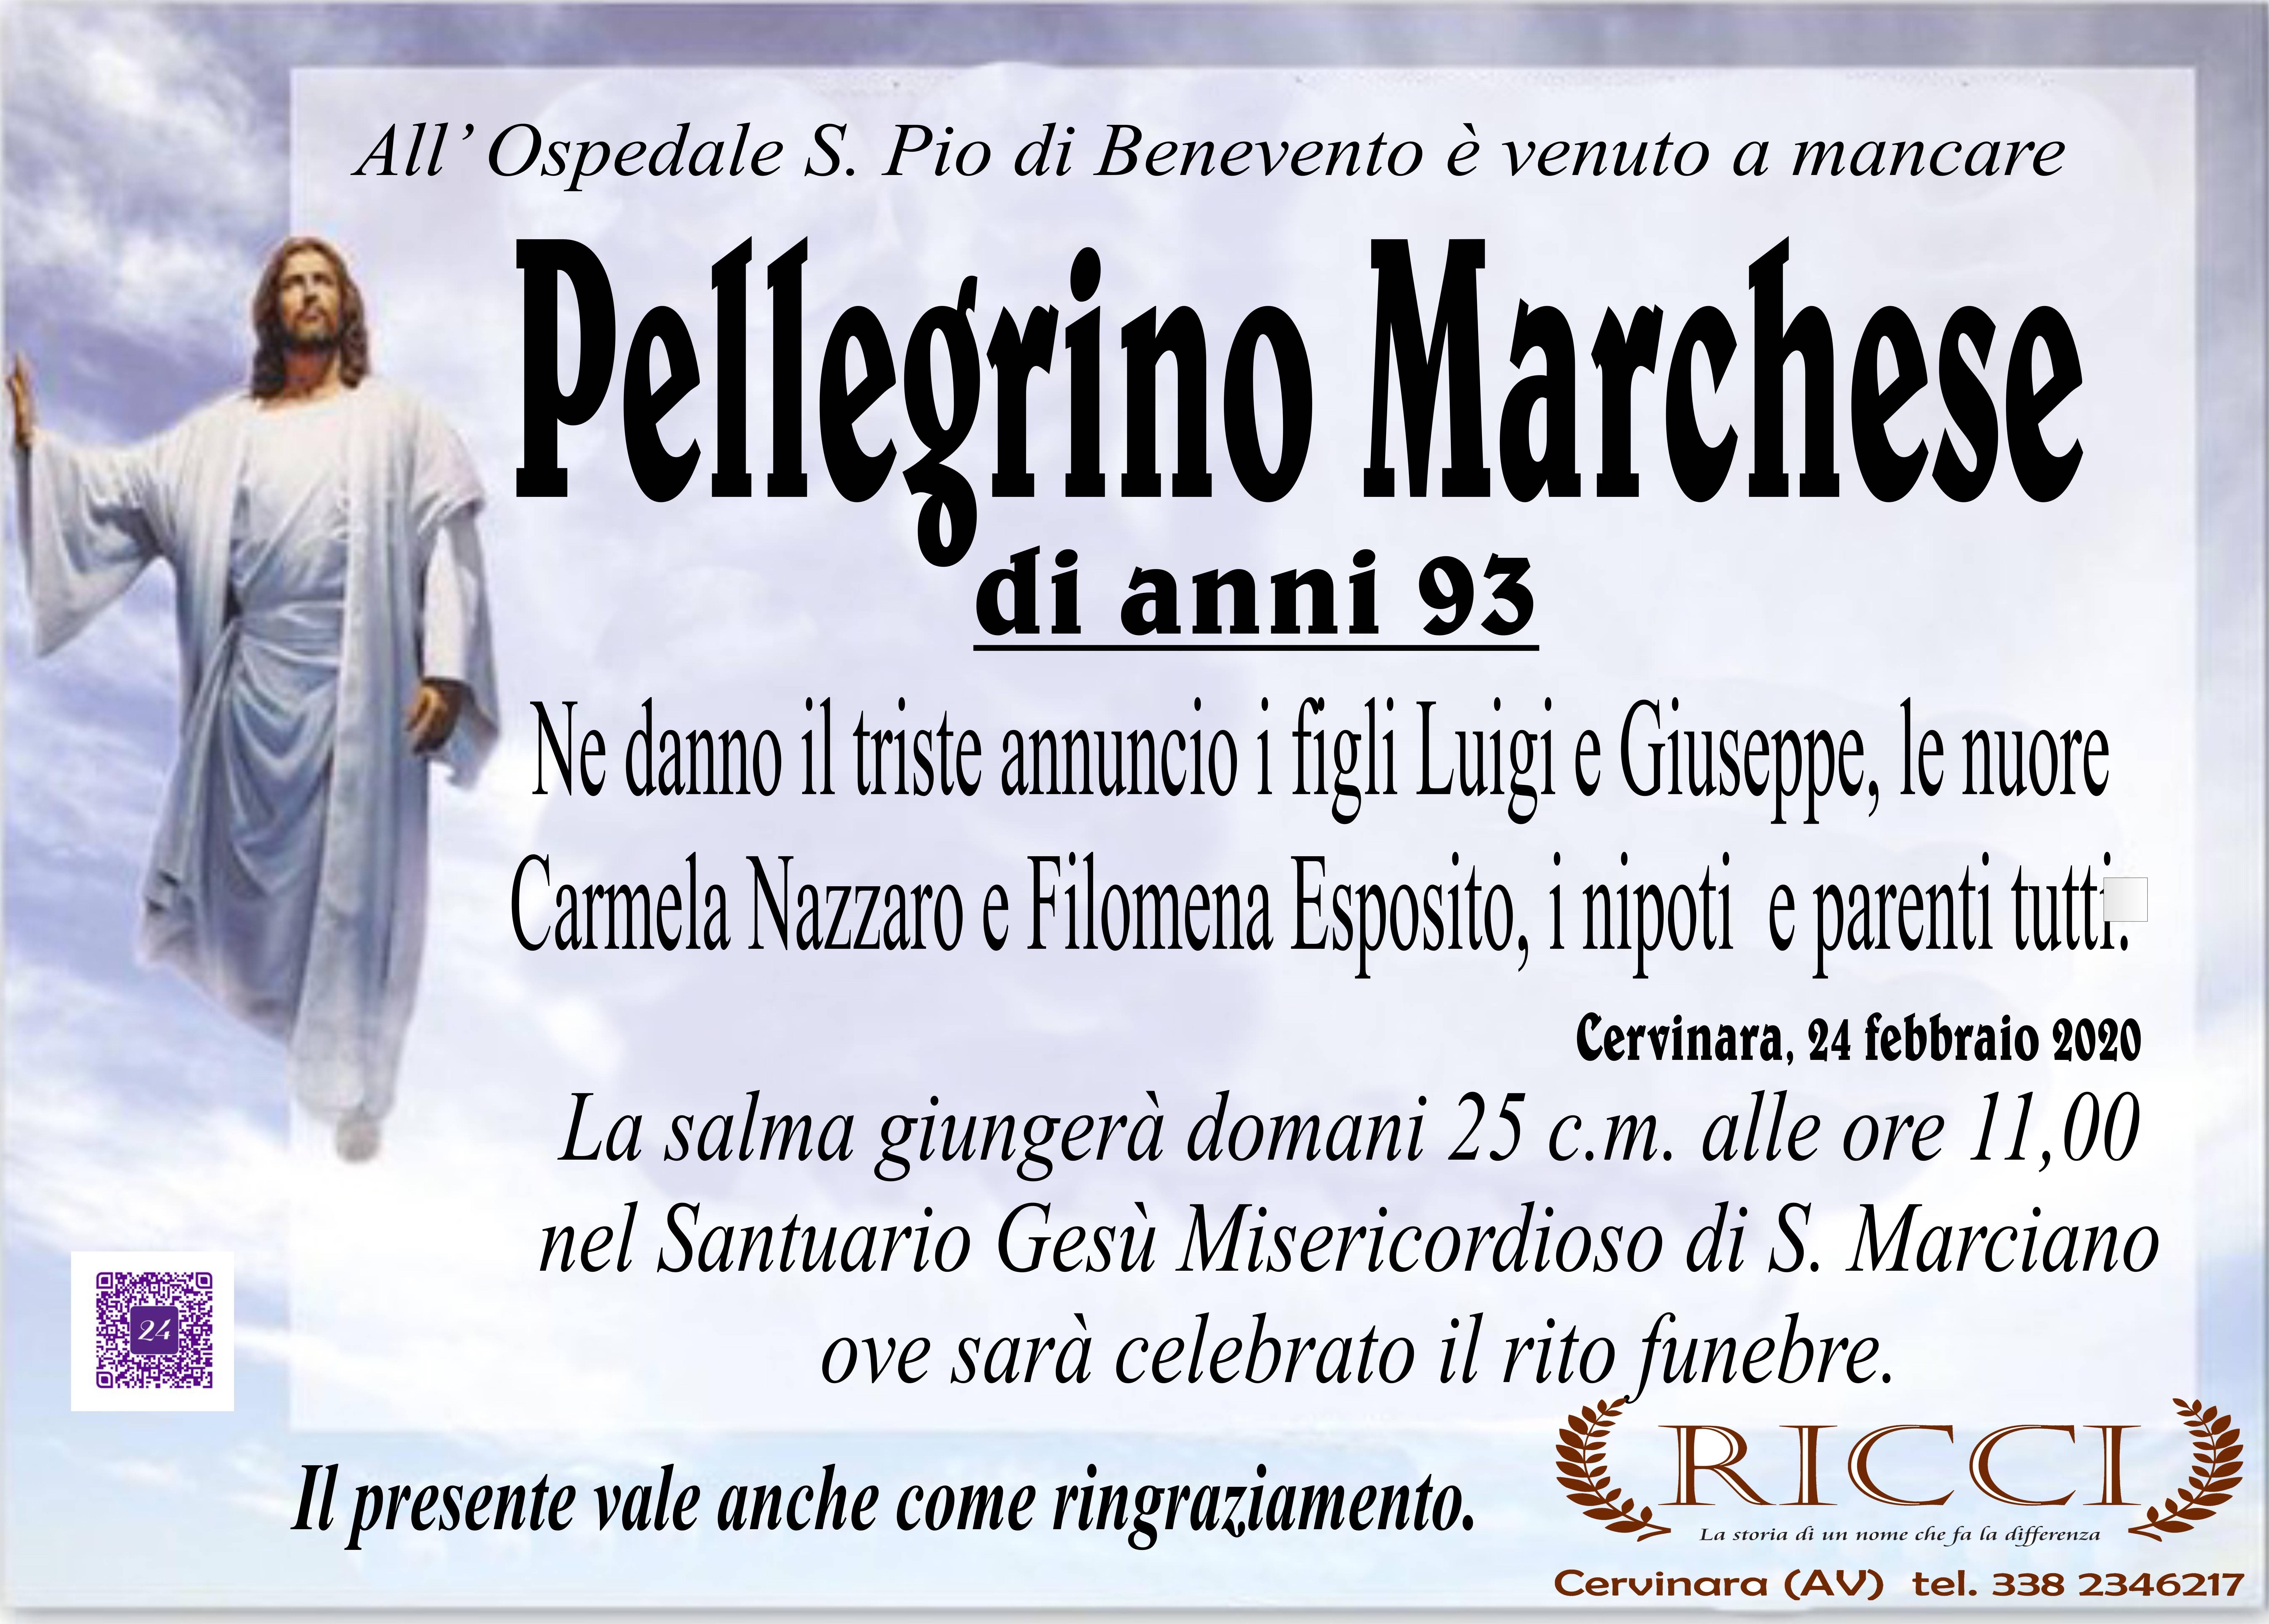 Pellegrino Marchese